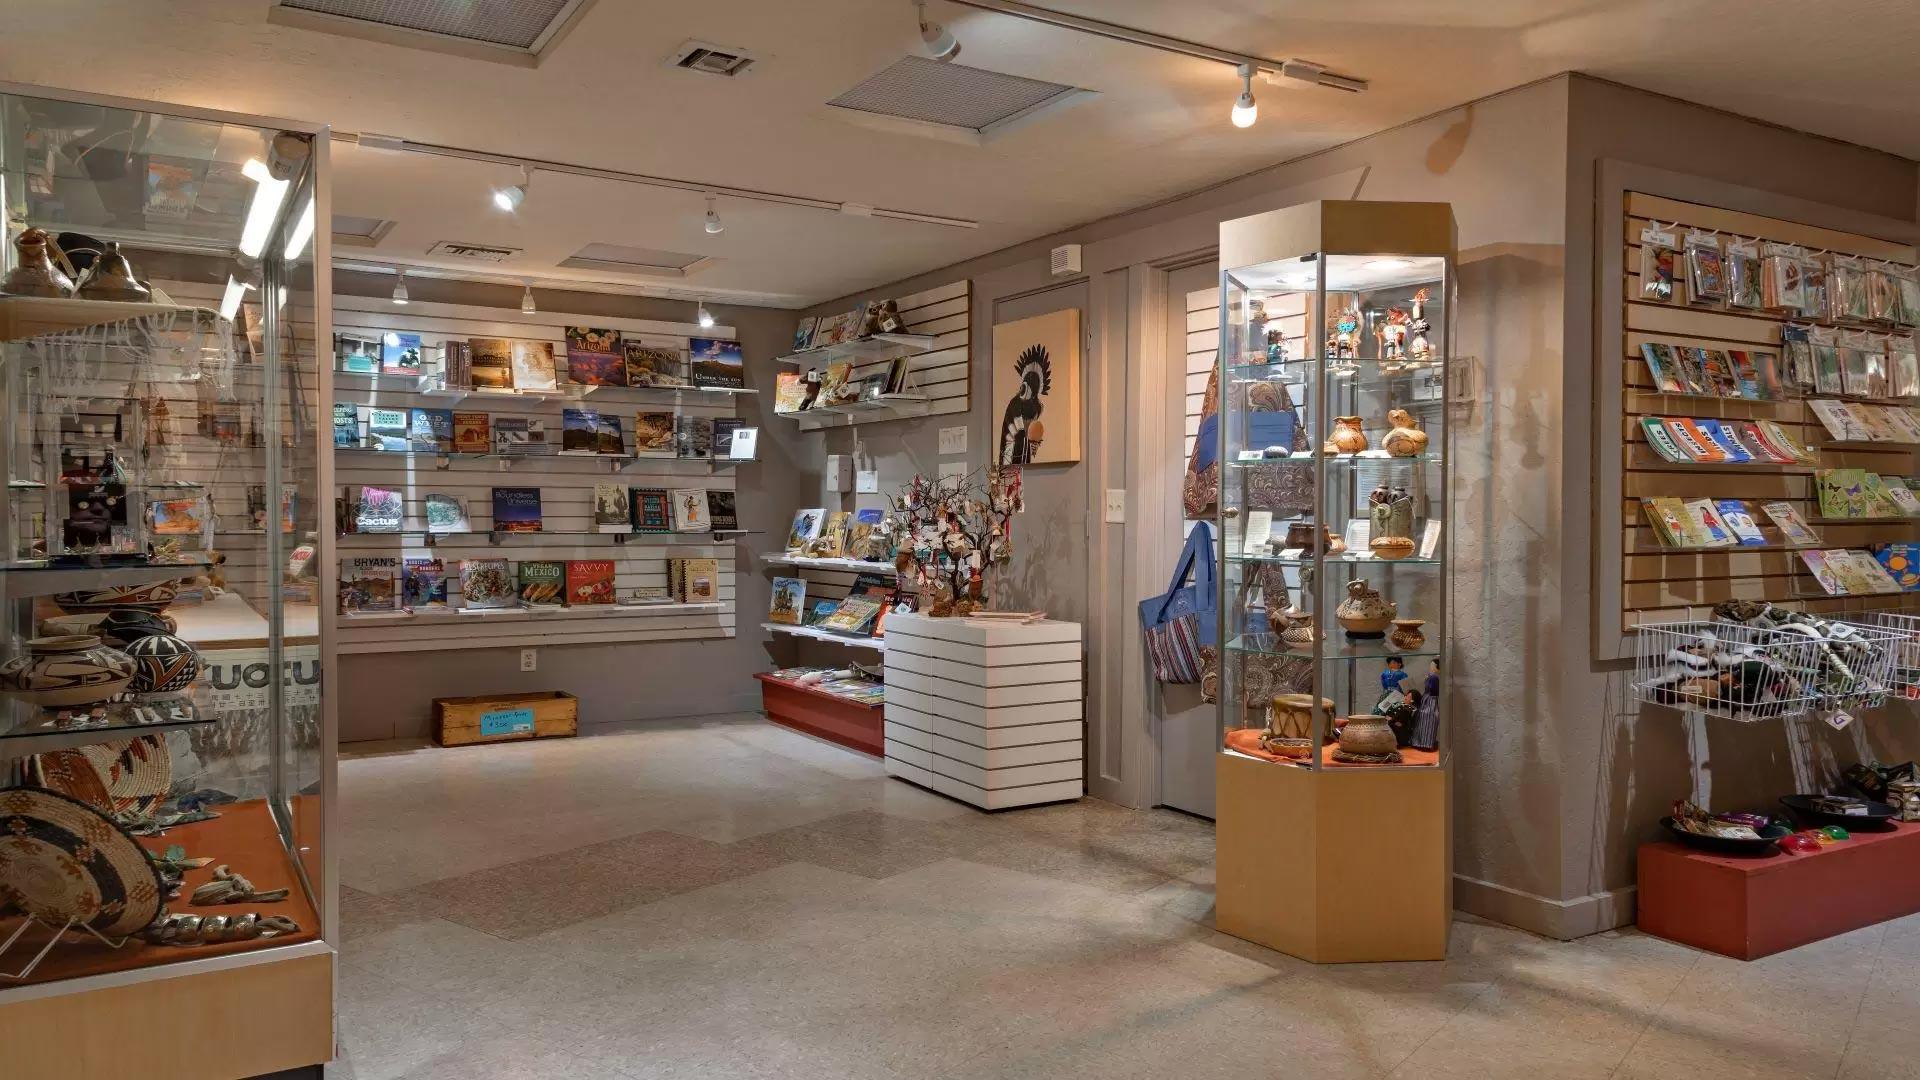 cave creek museum gift shop